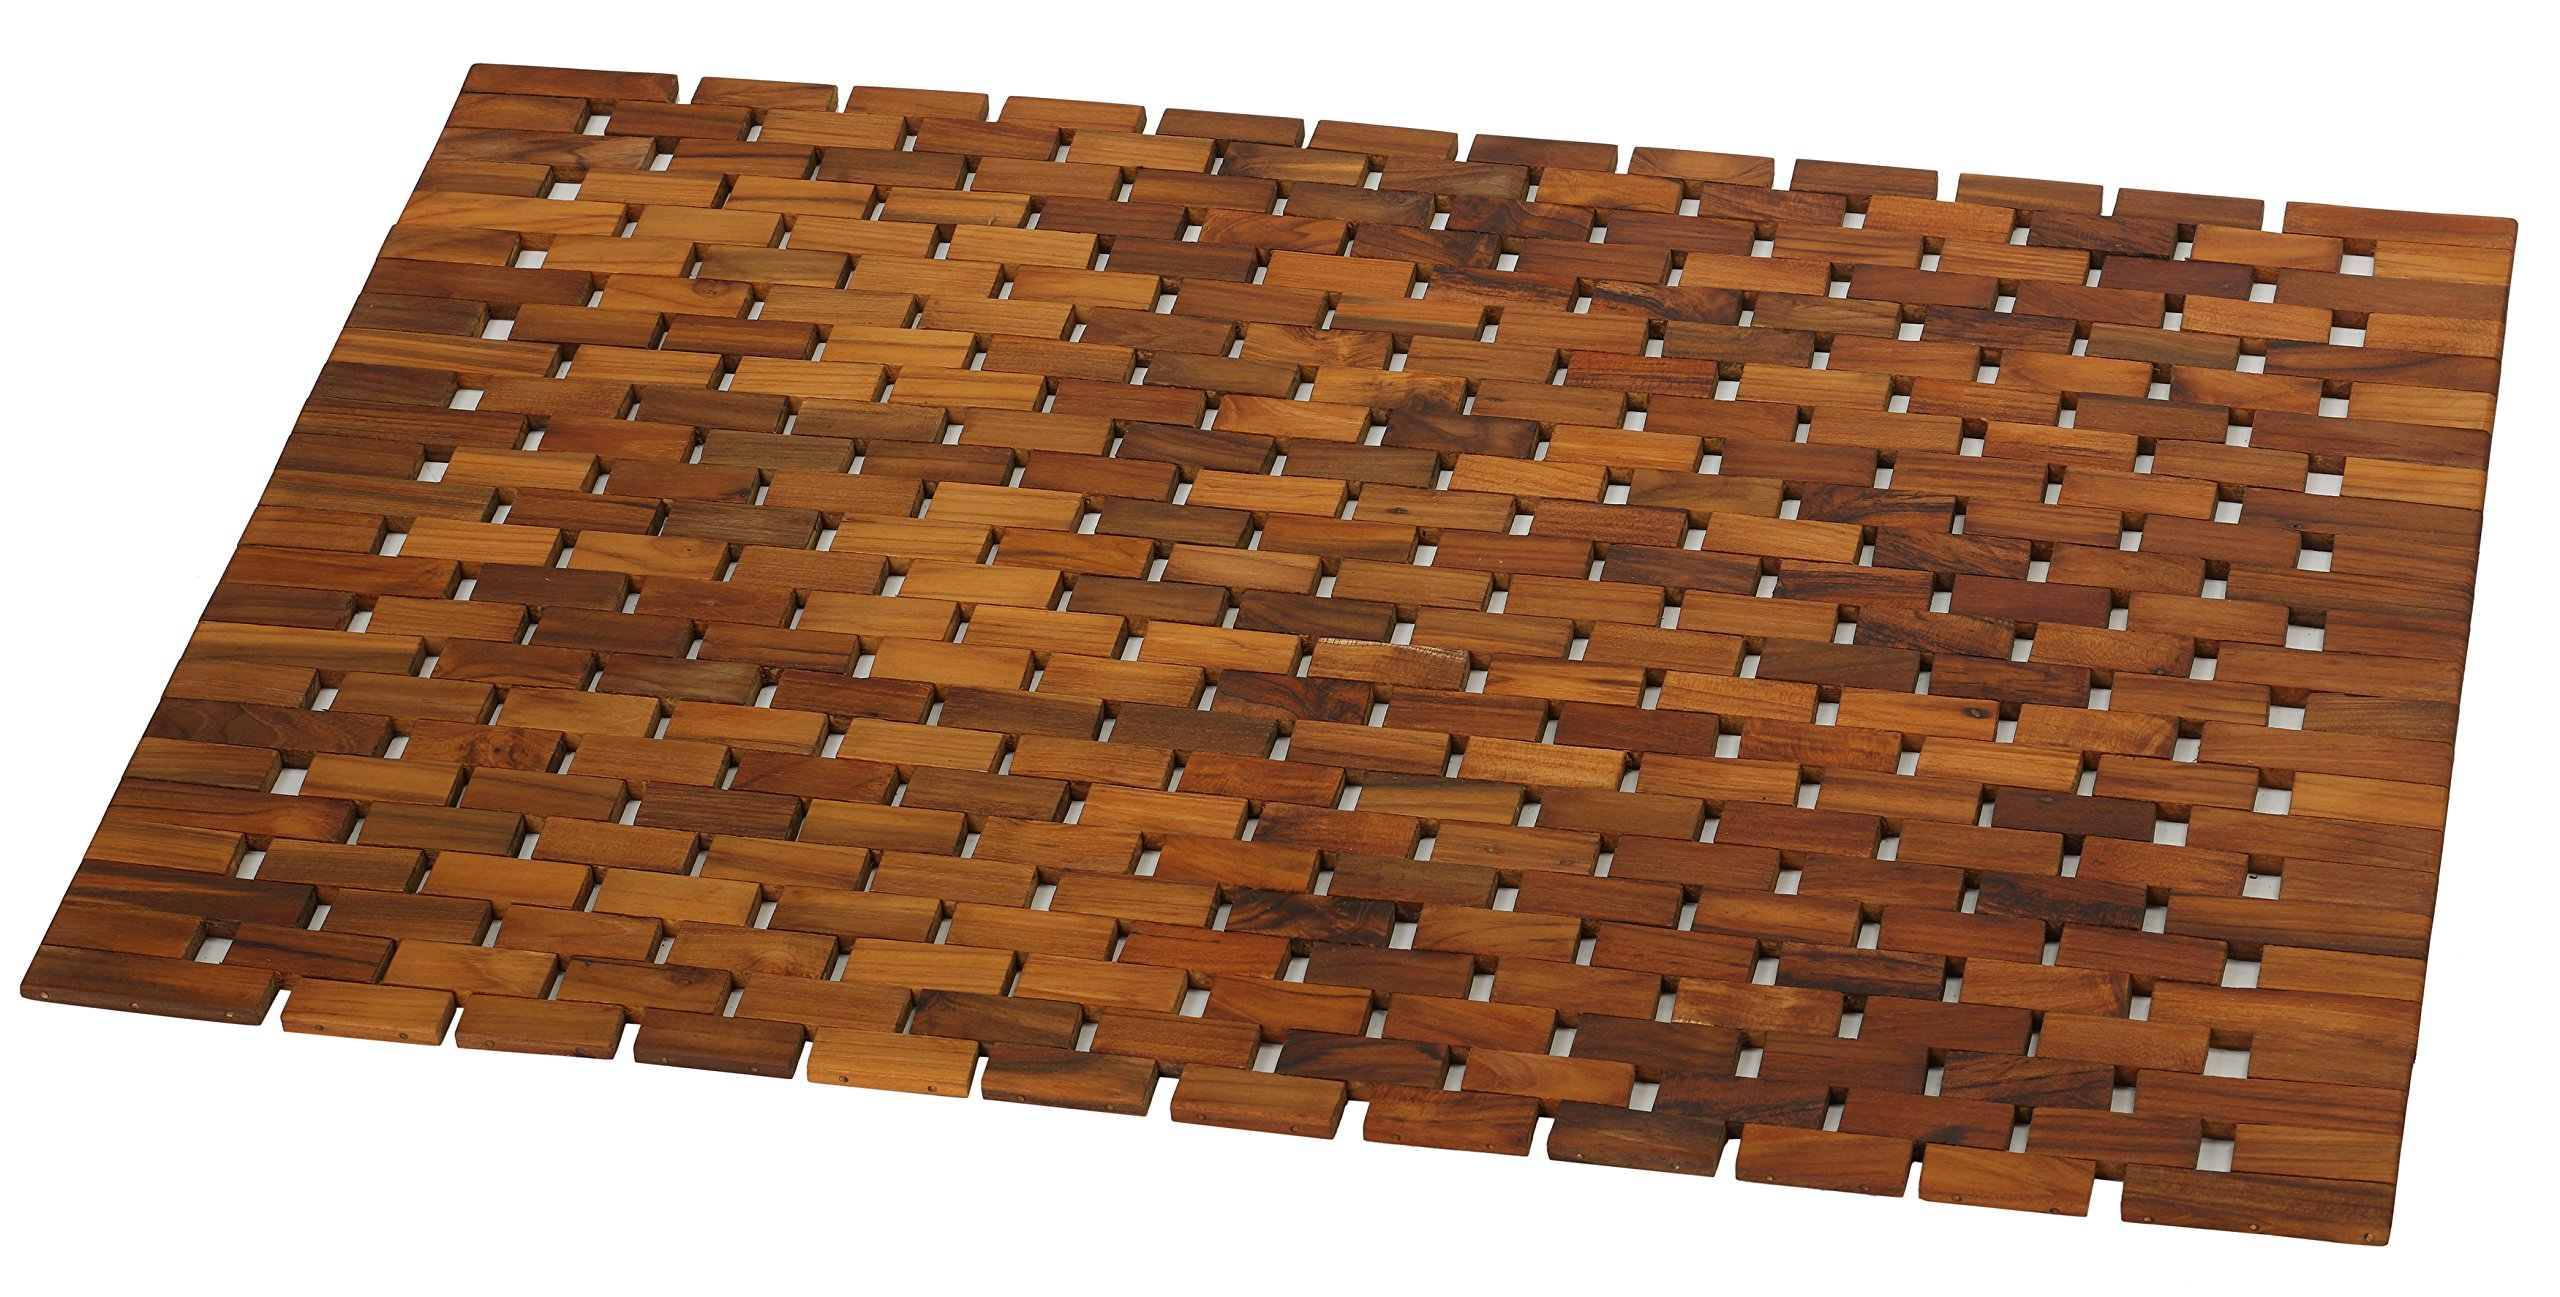 Bare Decor Kuki Spa Mosaic Shower Mat in Solid Teak Wood Oiled Finish, 30x20